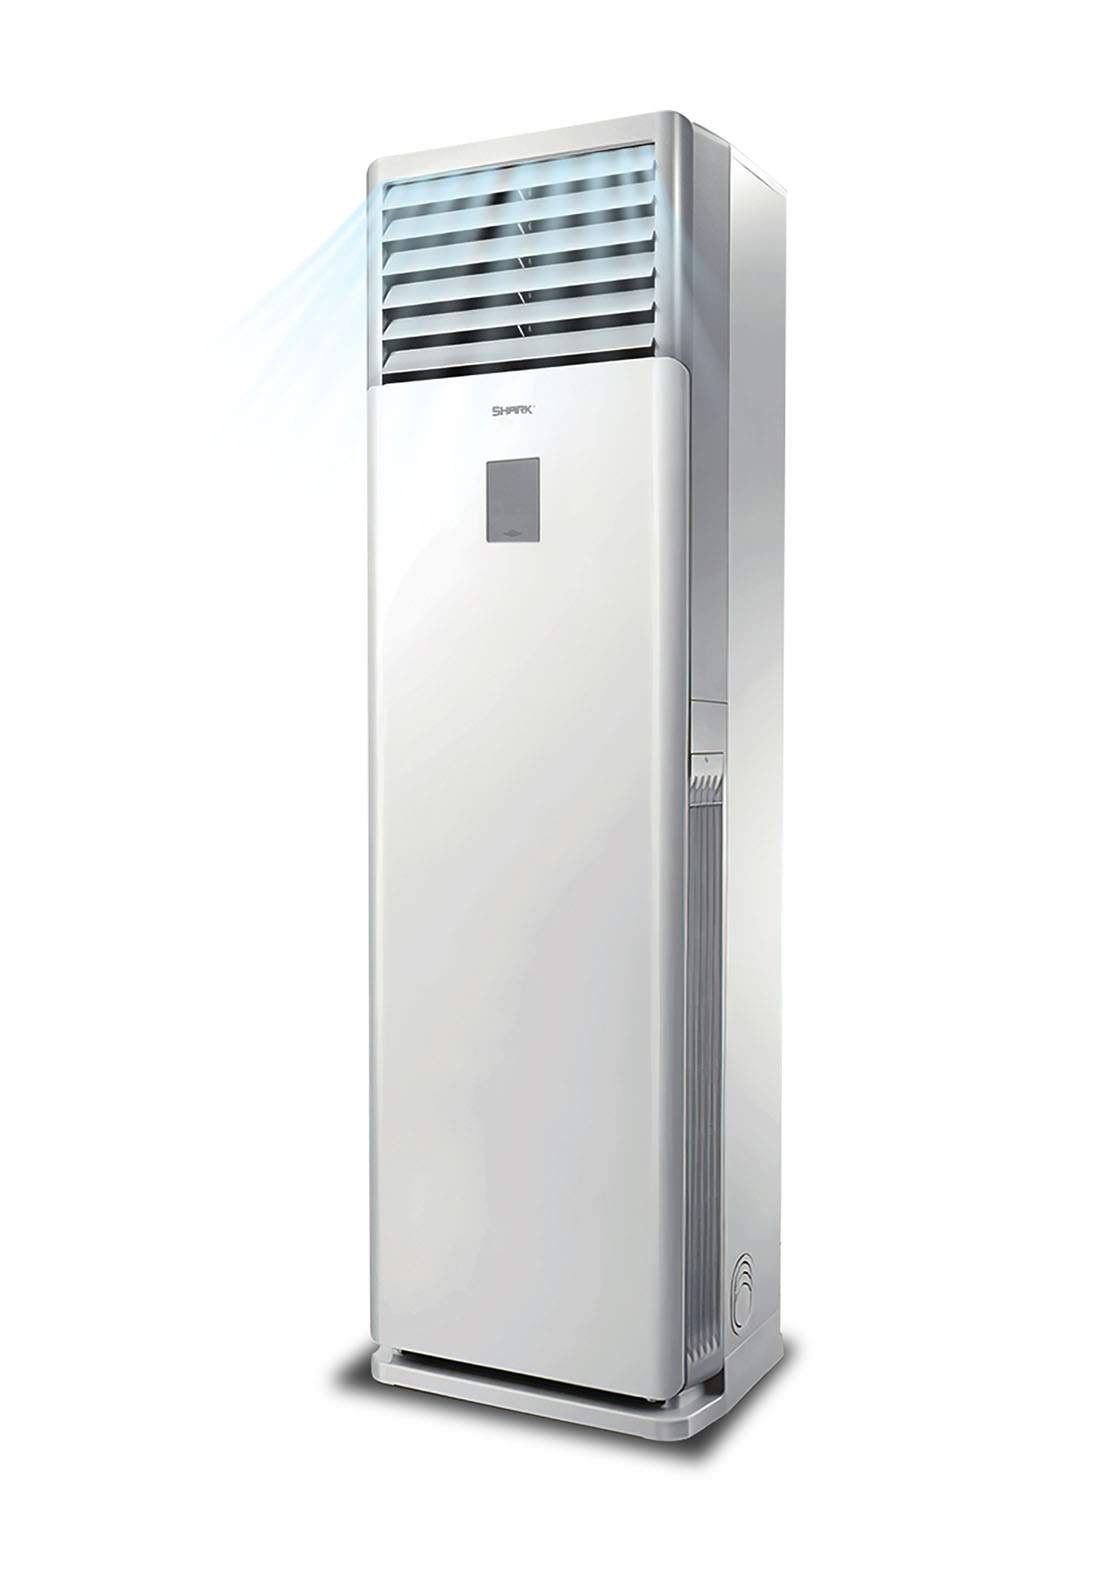 Shark Split Vertical Air Conditioner 4 Ton سبلت عمودي 4 طن